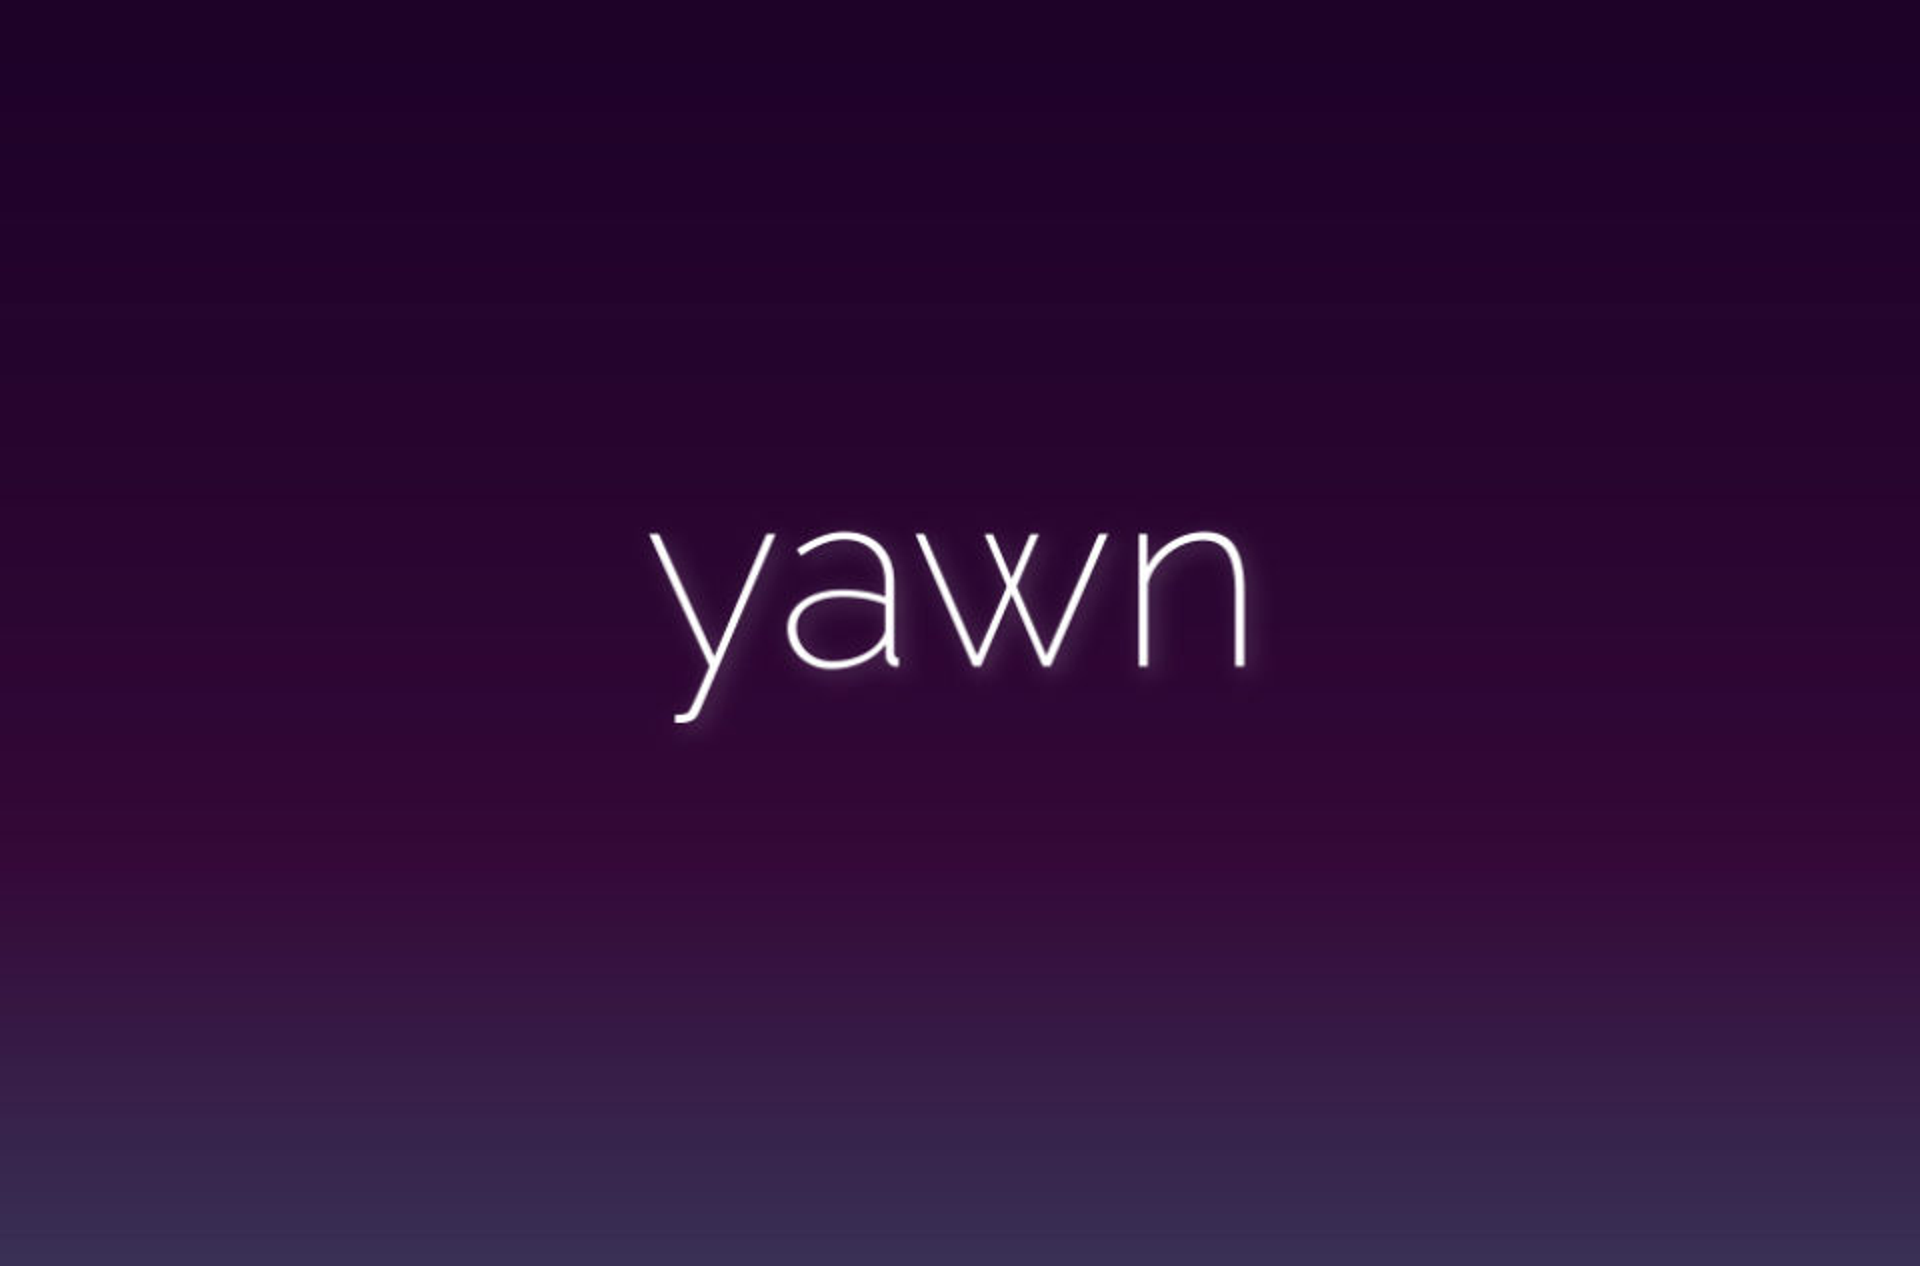 Headjam yawn image 01